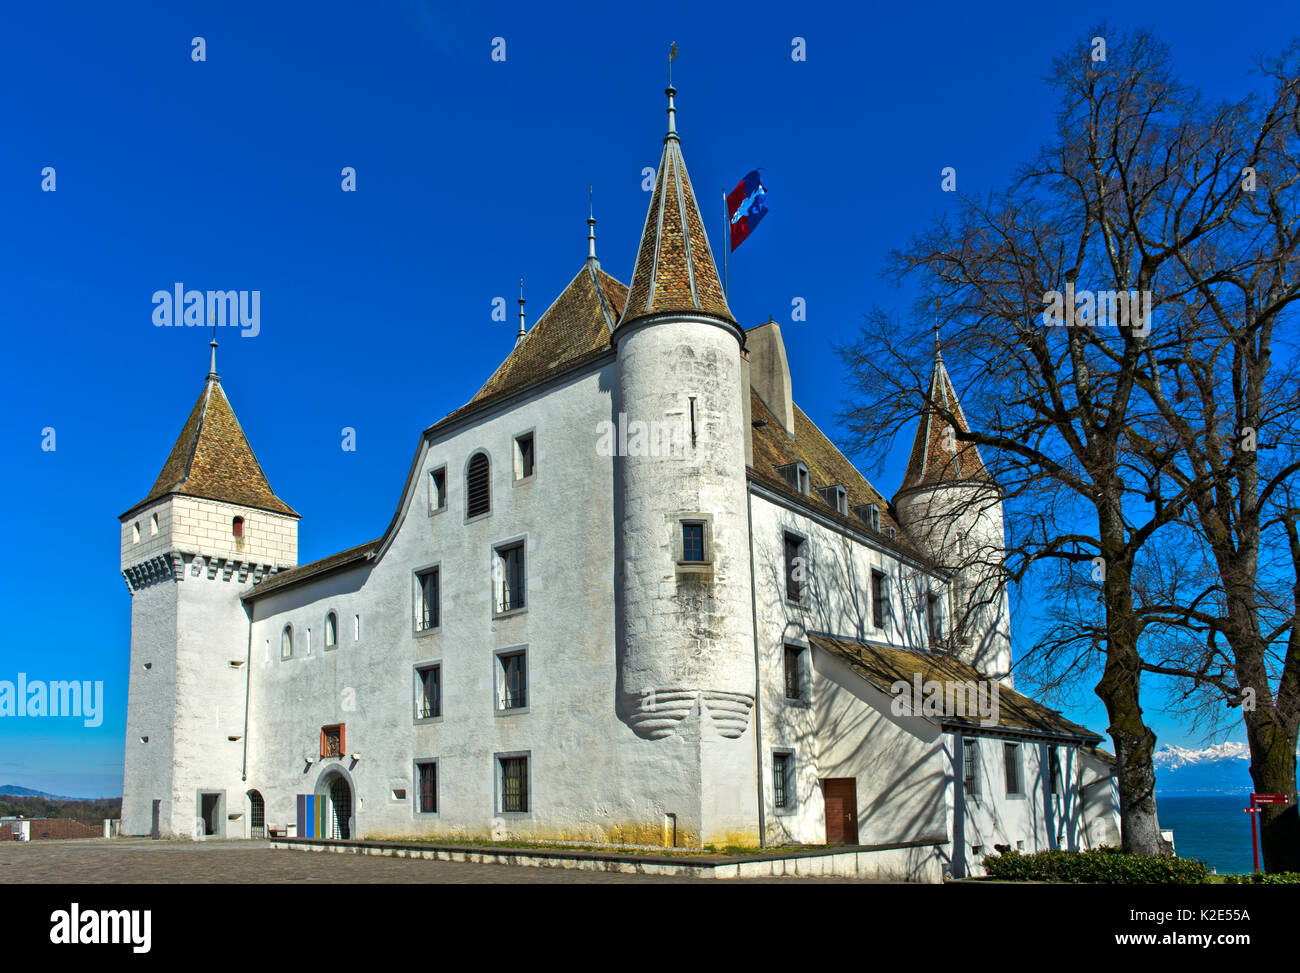 Nyon Castle, Chateau de Nyon, Nyon, Vaud, Switzerland - Stock Image